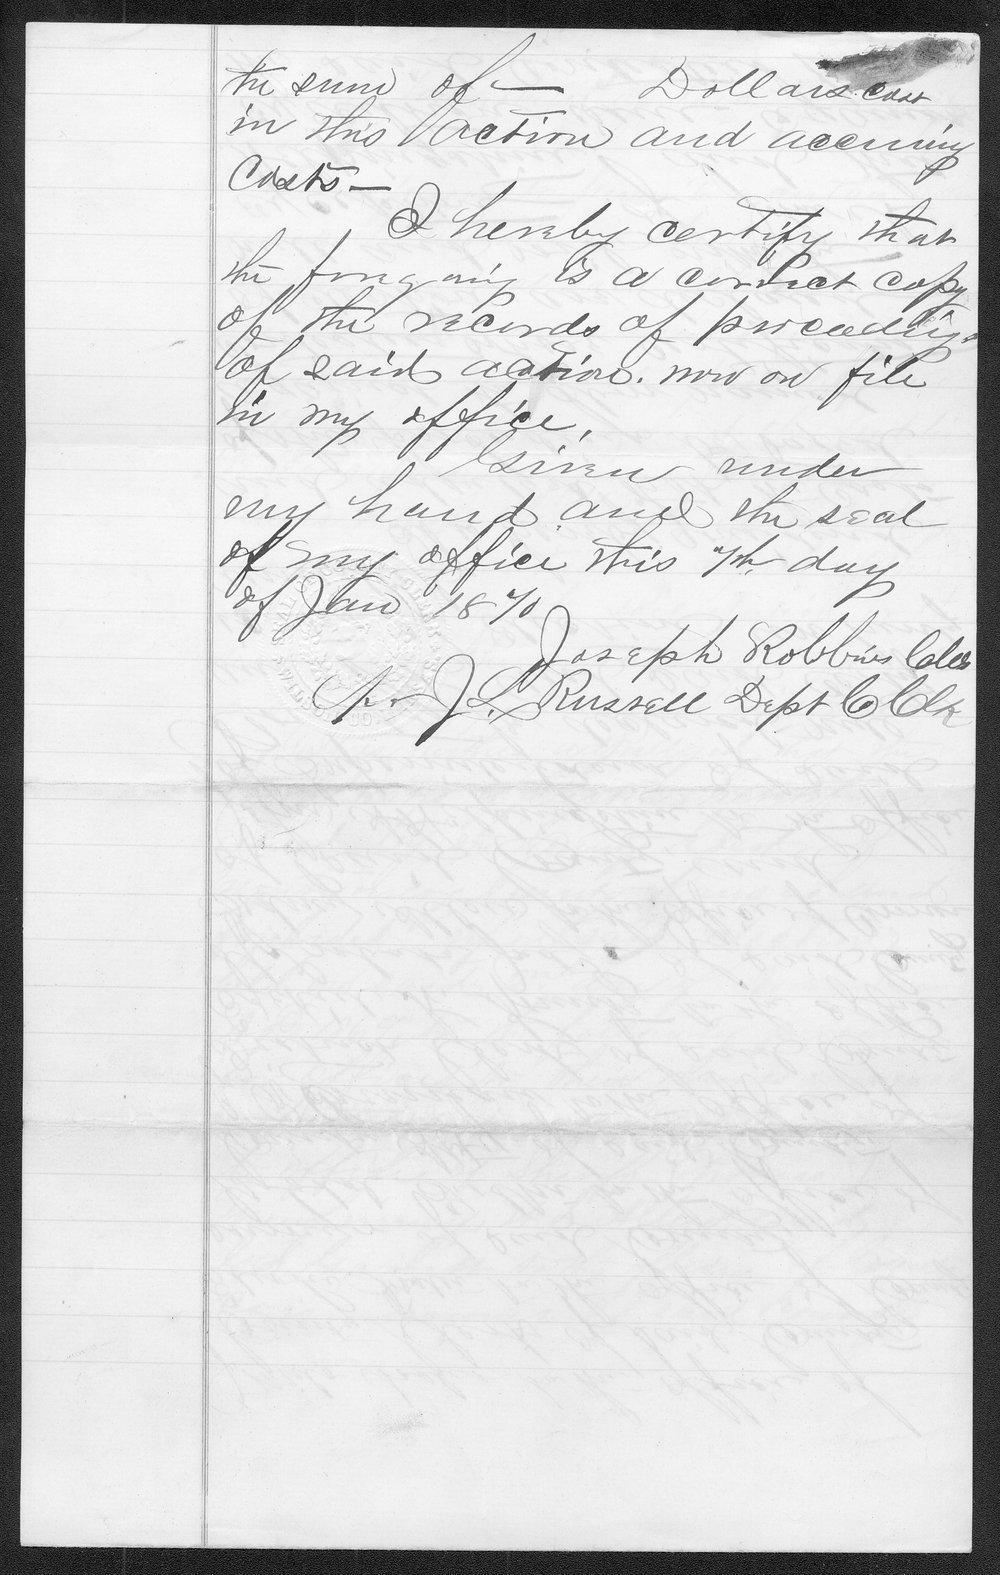 Montgomery County organization records - 8